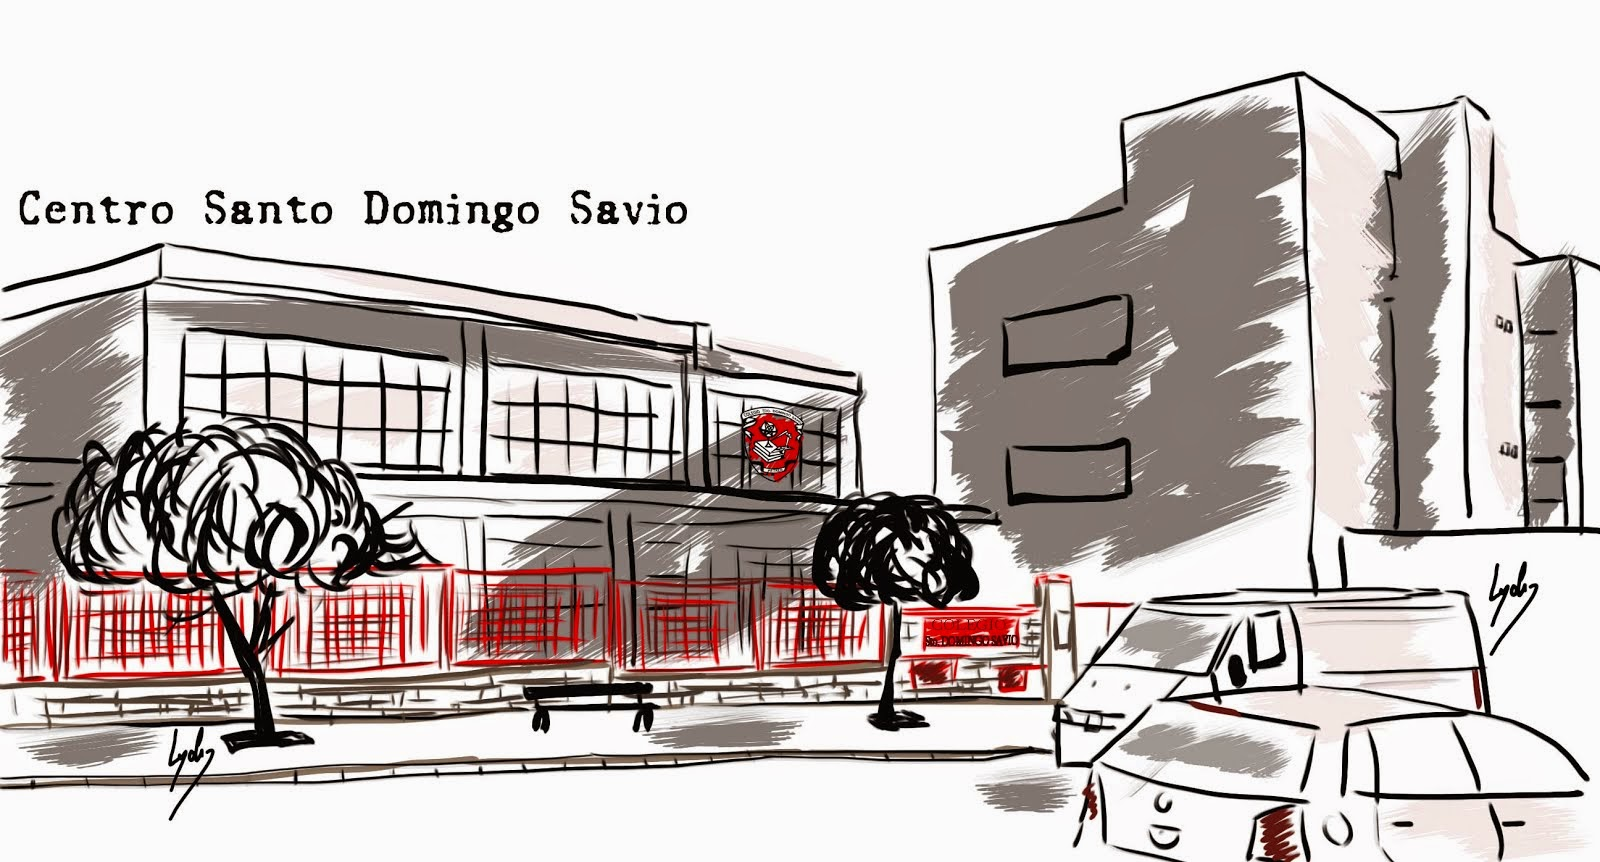 Rodant pel món es un blog del Centro Santo Domingo Savio, Petrer